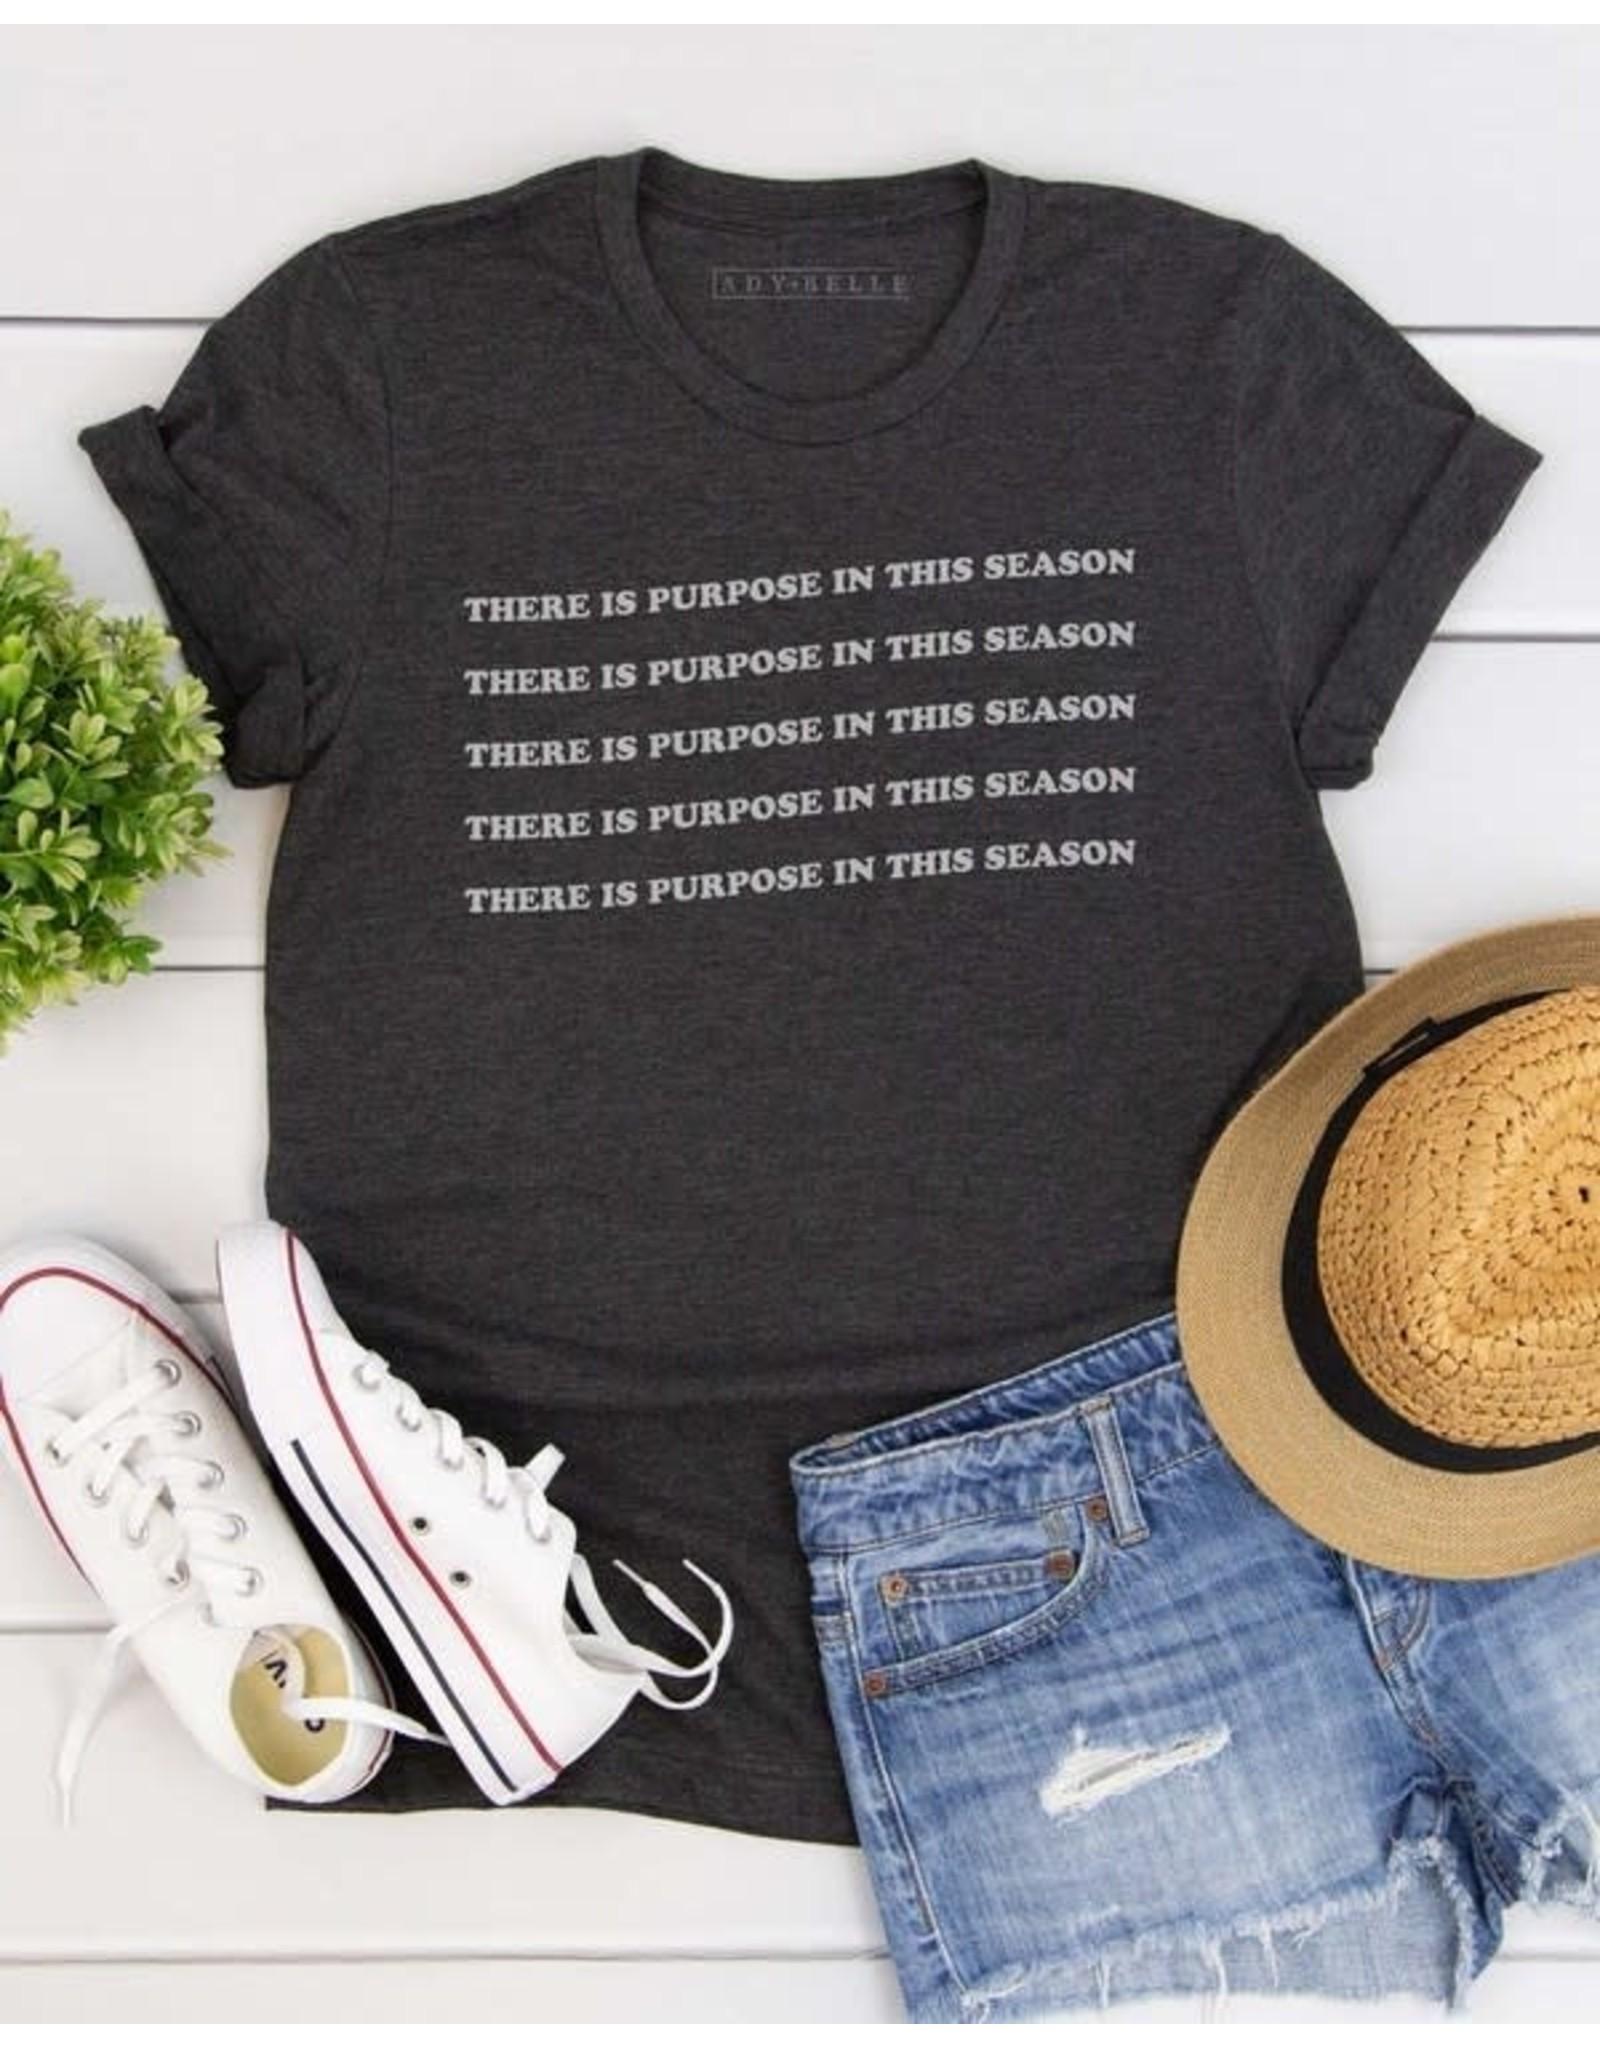 Purpose in the Season T-Shirt